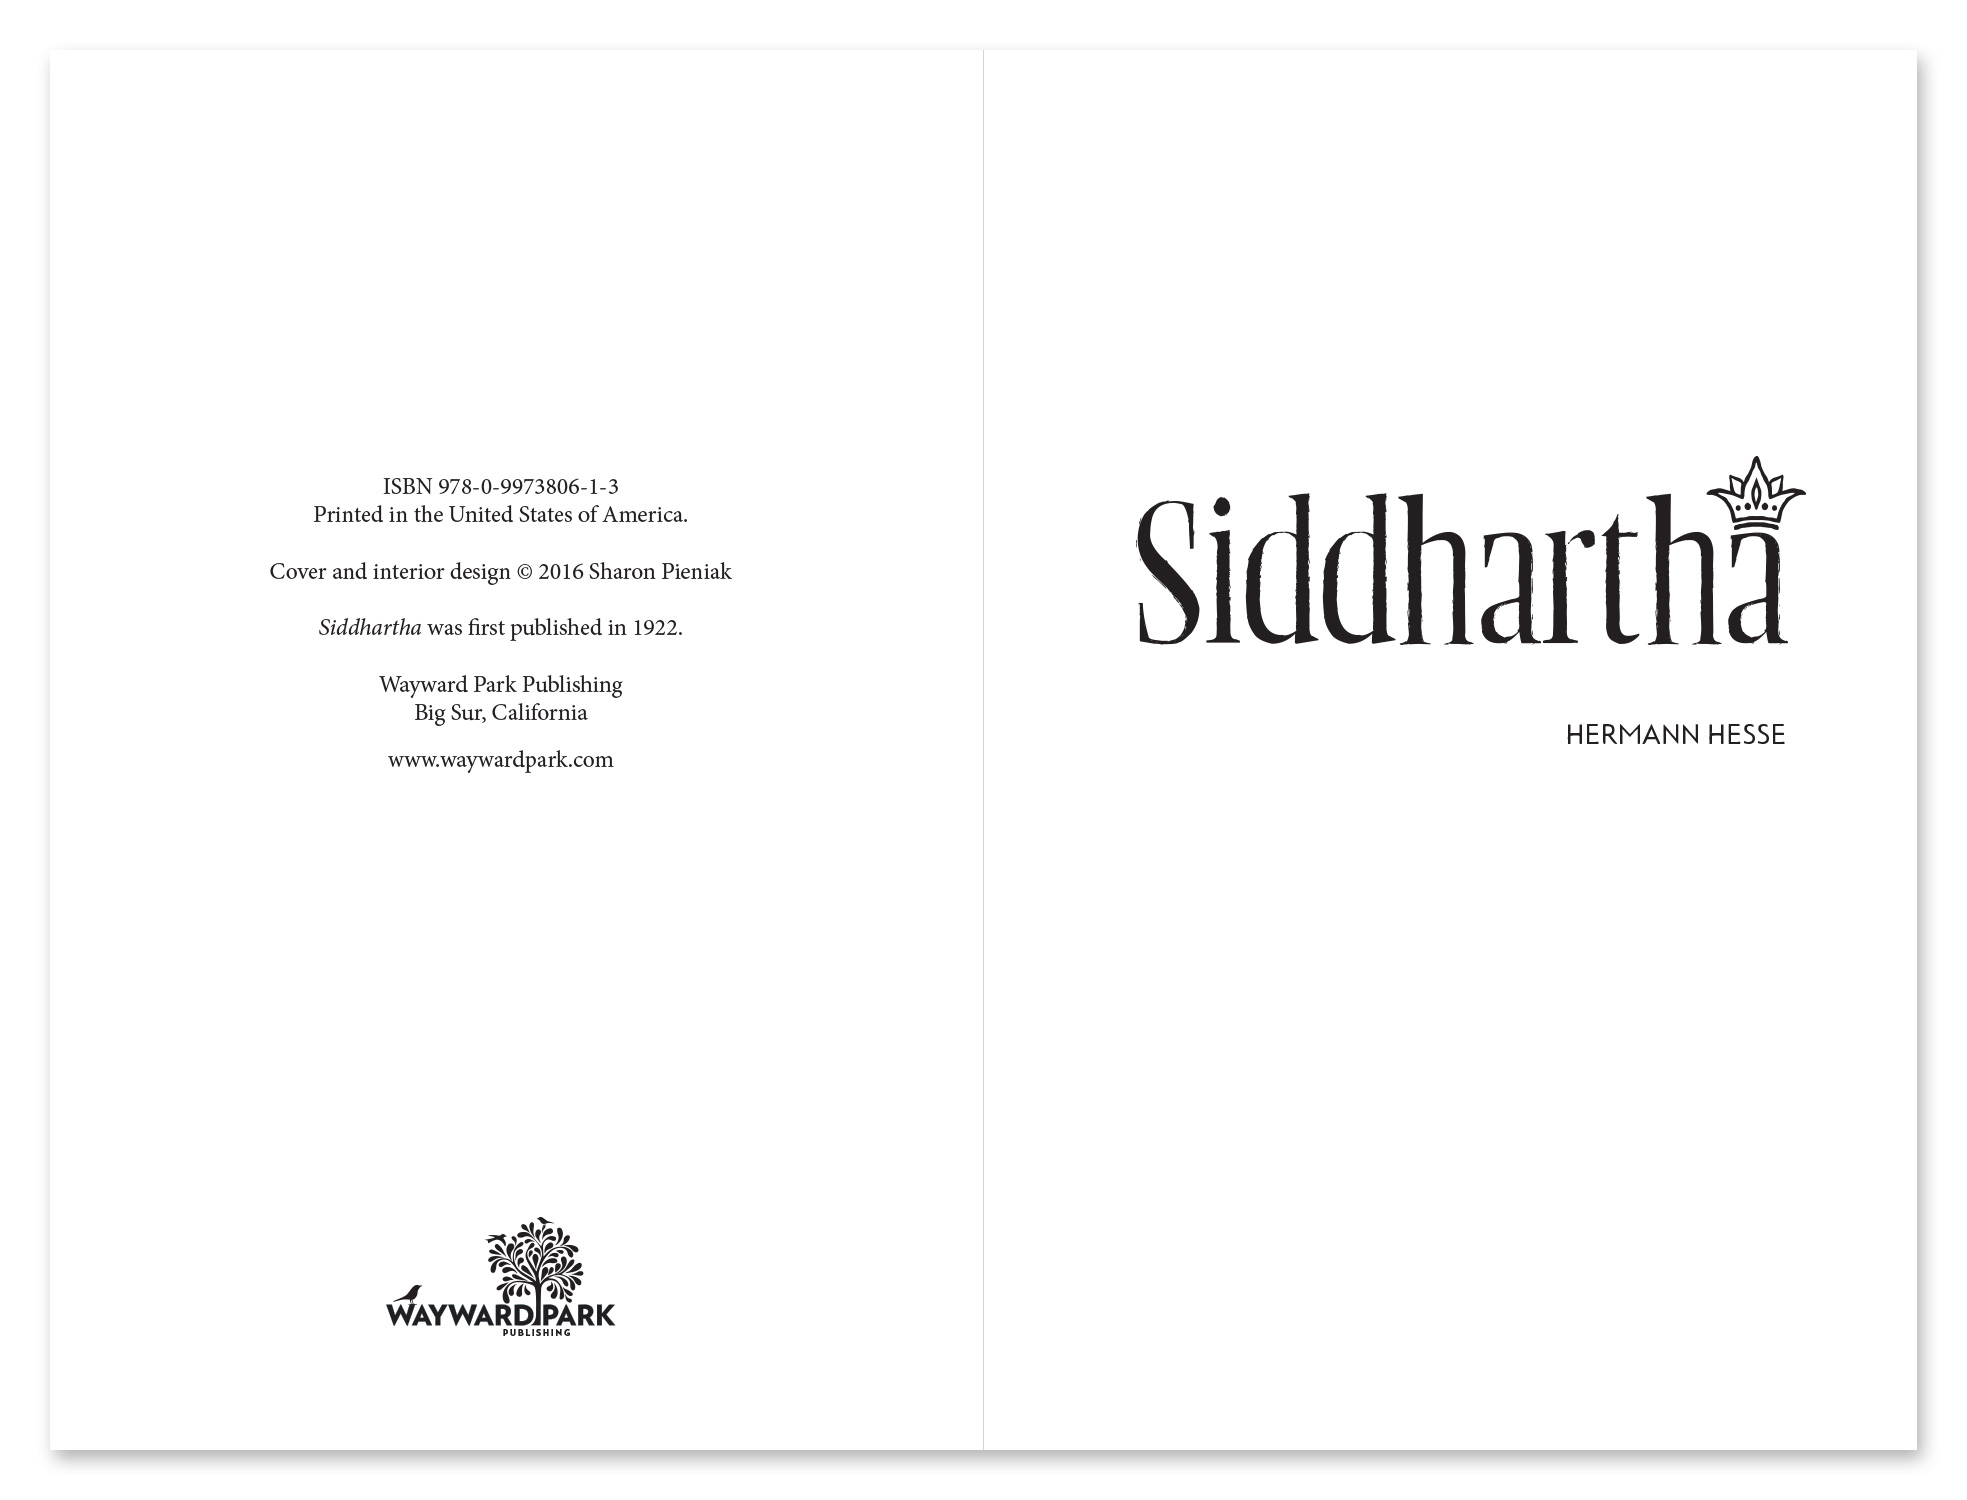 Siddhartha-2b.jpg